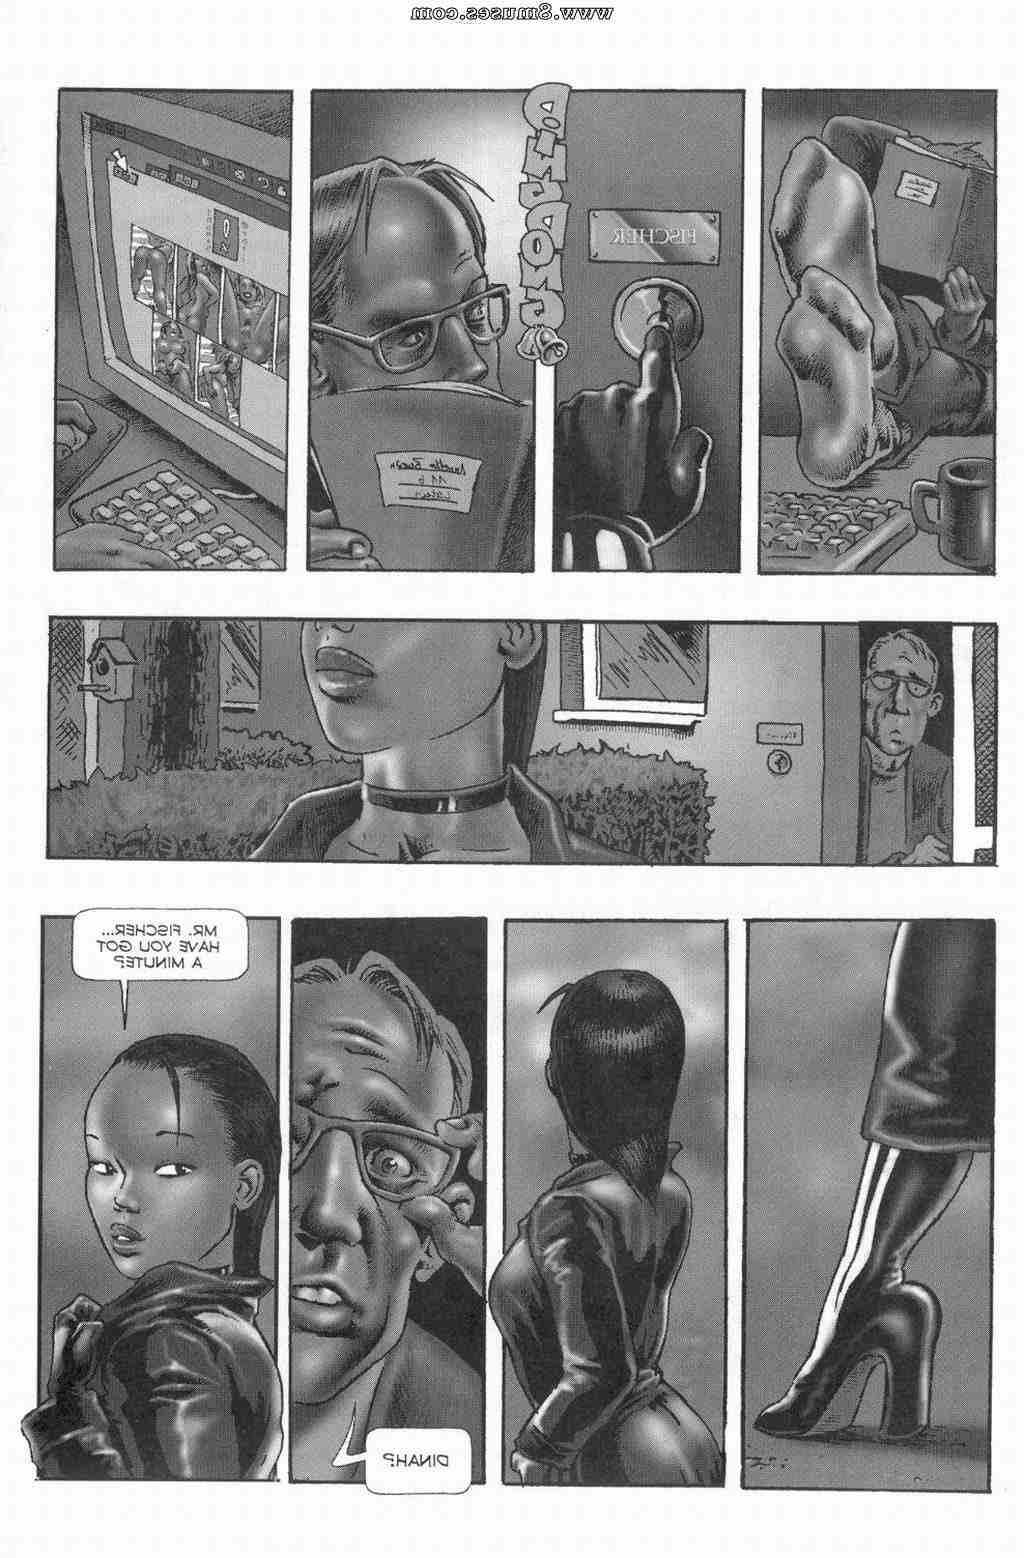 EROS-Comics/Alraune/Alraune-06 Alraune_06__8muses_-_Sex_and_Porn_Comics_5.jpg